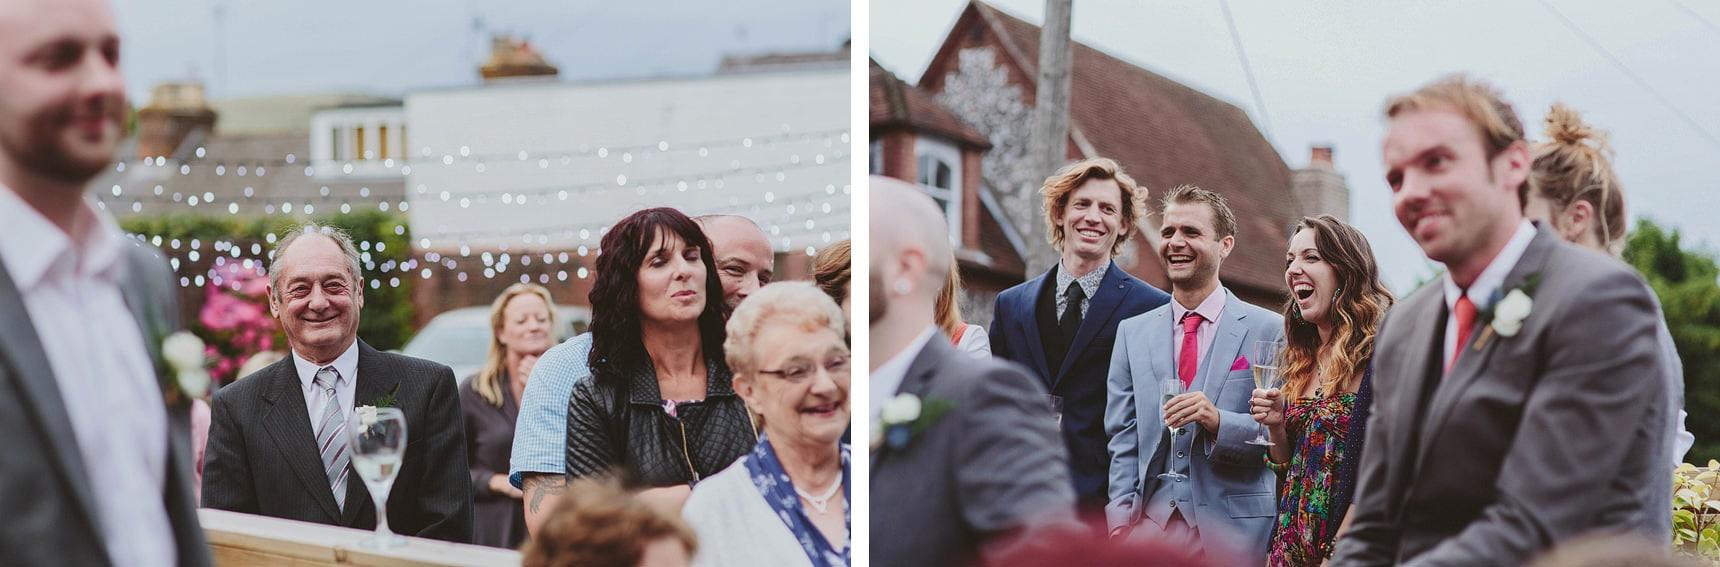 sussex uk wedding photography